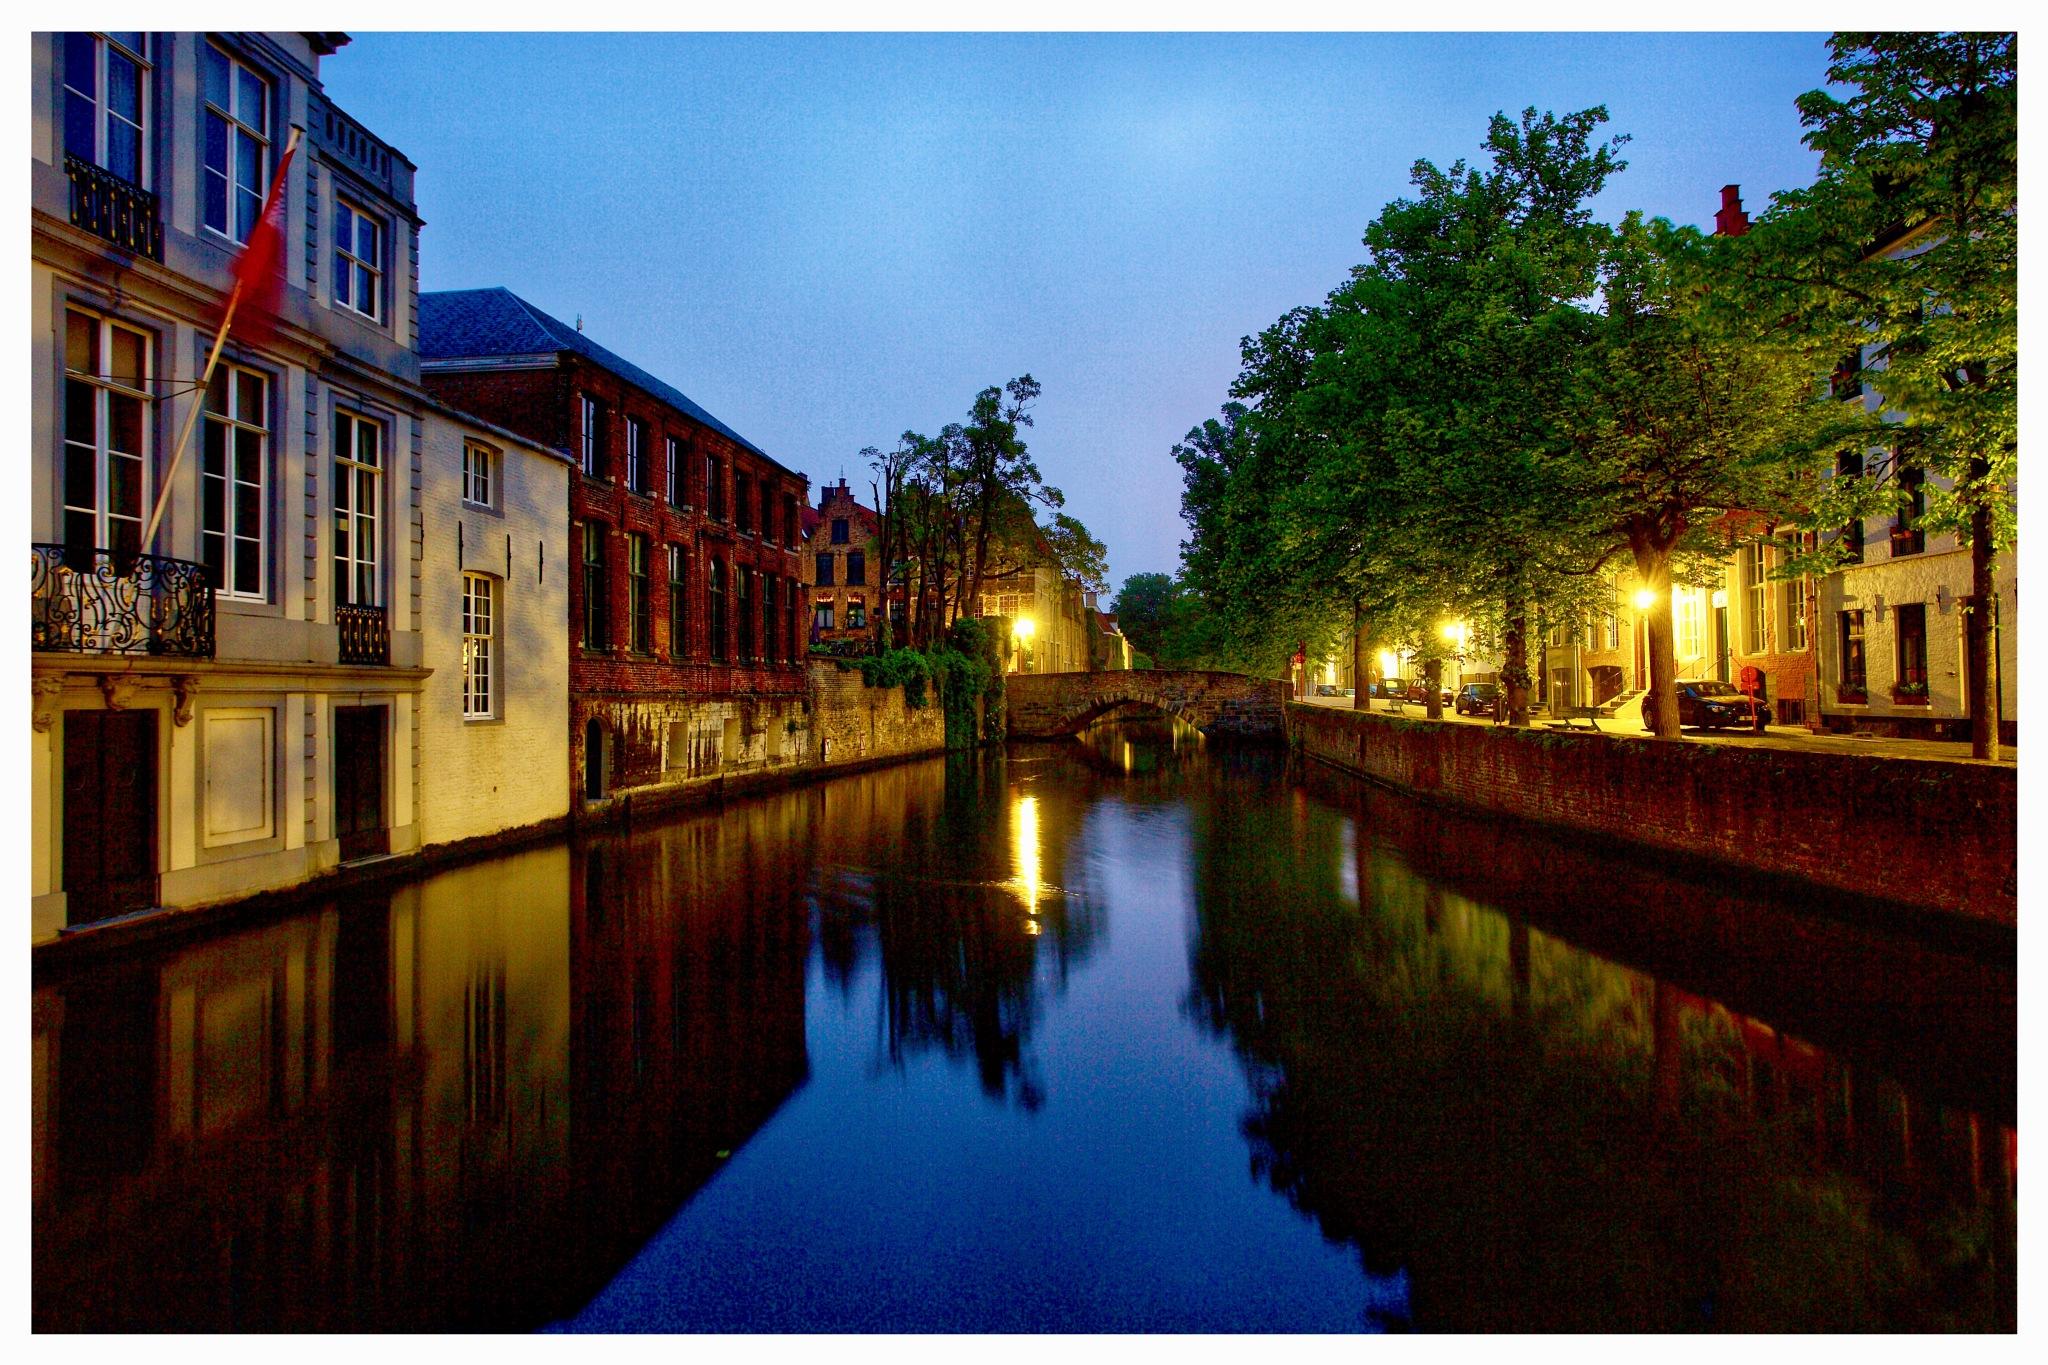 Bruges/Belgium by adonismalamos1